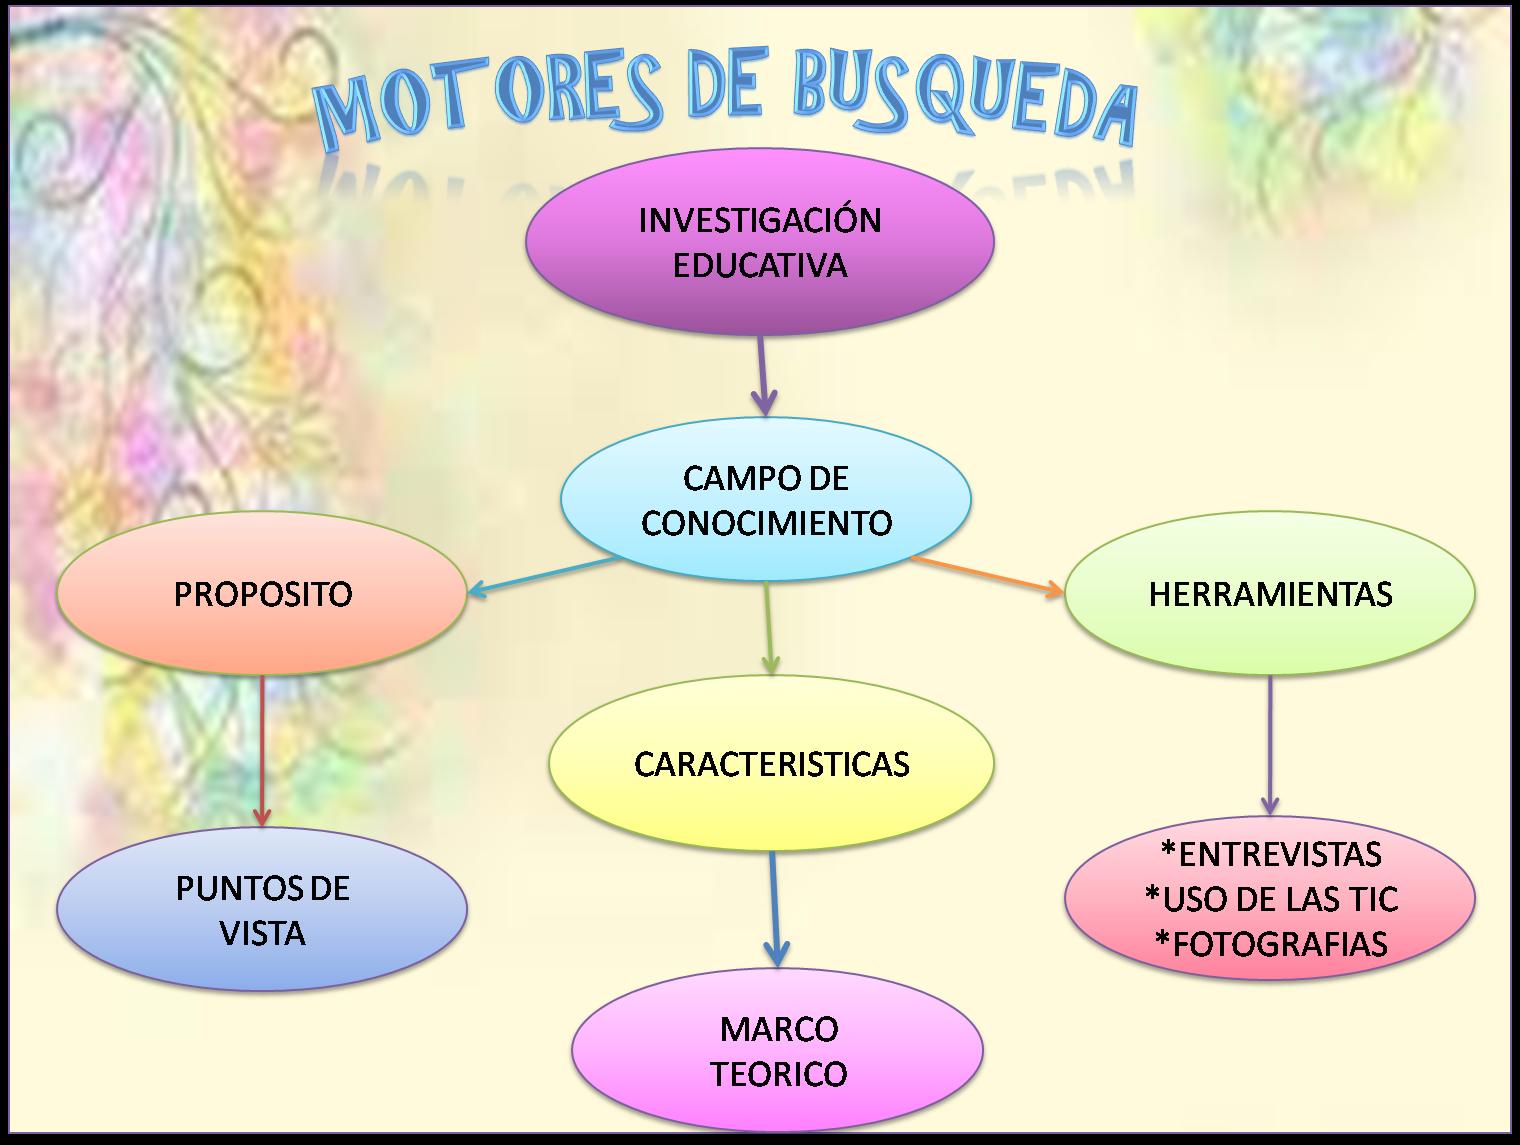 ENFOQUES TEÓRICOS DEL APRENDIZAJE. | Aprendizaje en linea